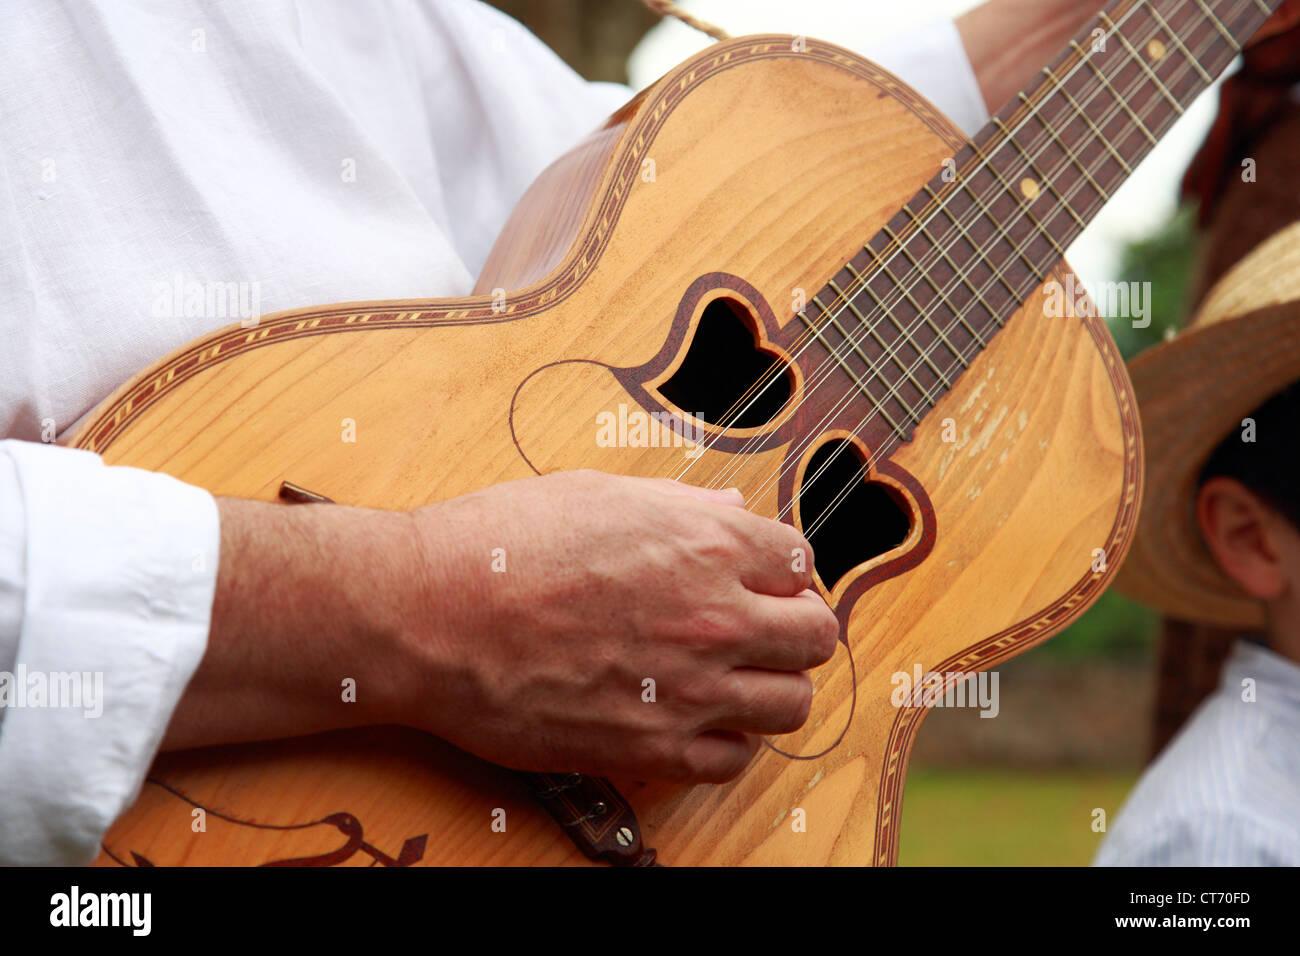 "El hombre tocando guitarra típica de las islas Azores. Nombre Local portugués es ""viola da terra"". Foto de stock"